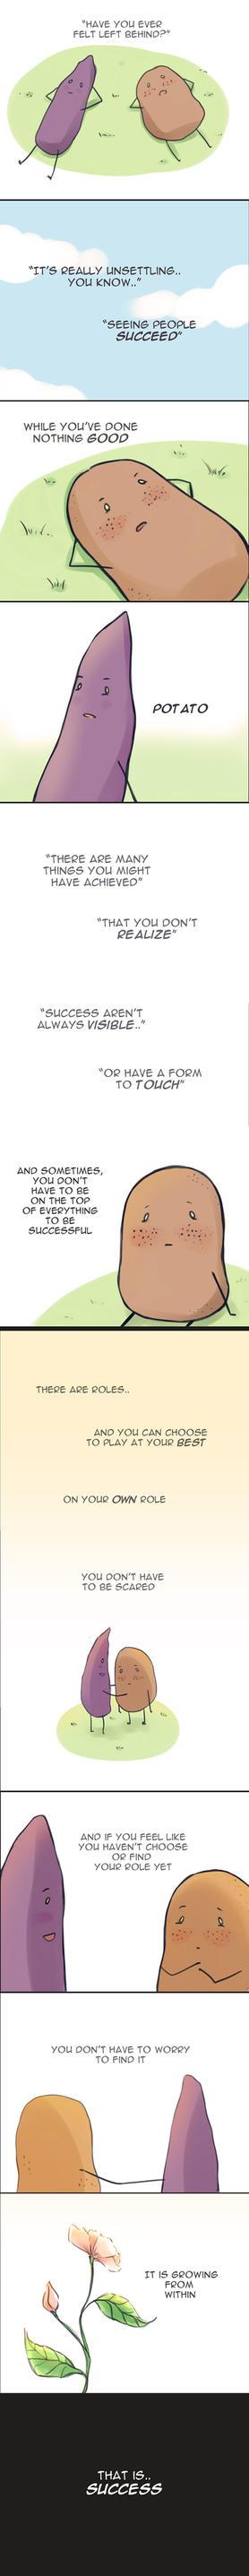 Potato story by roerow